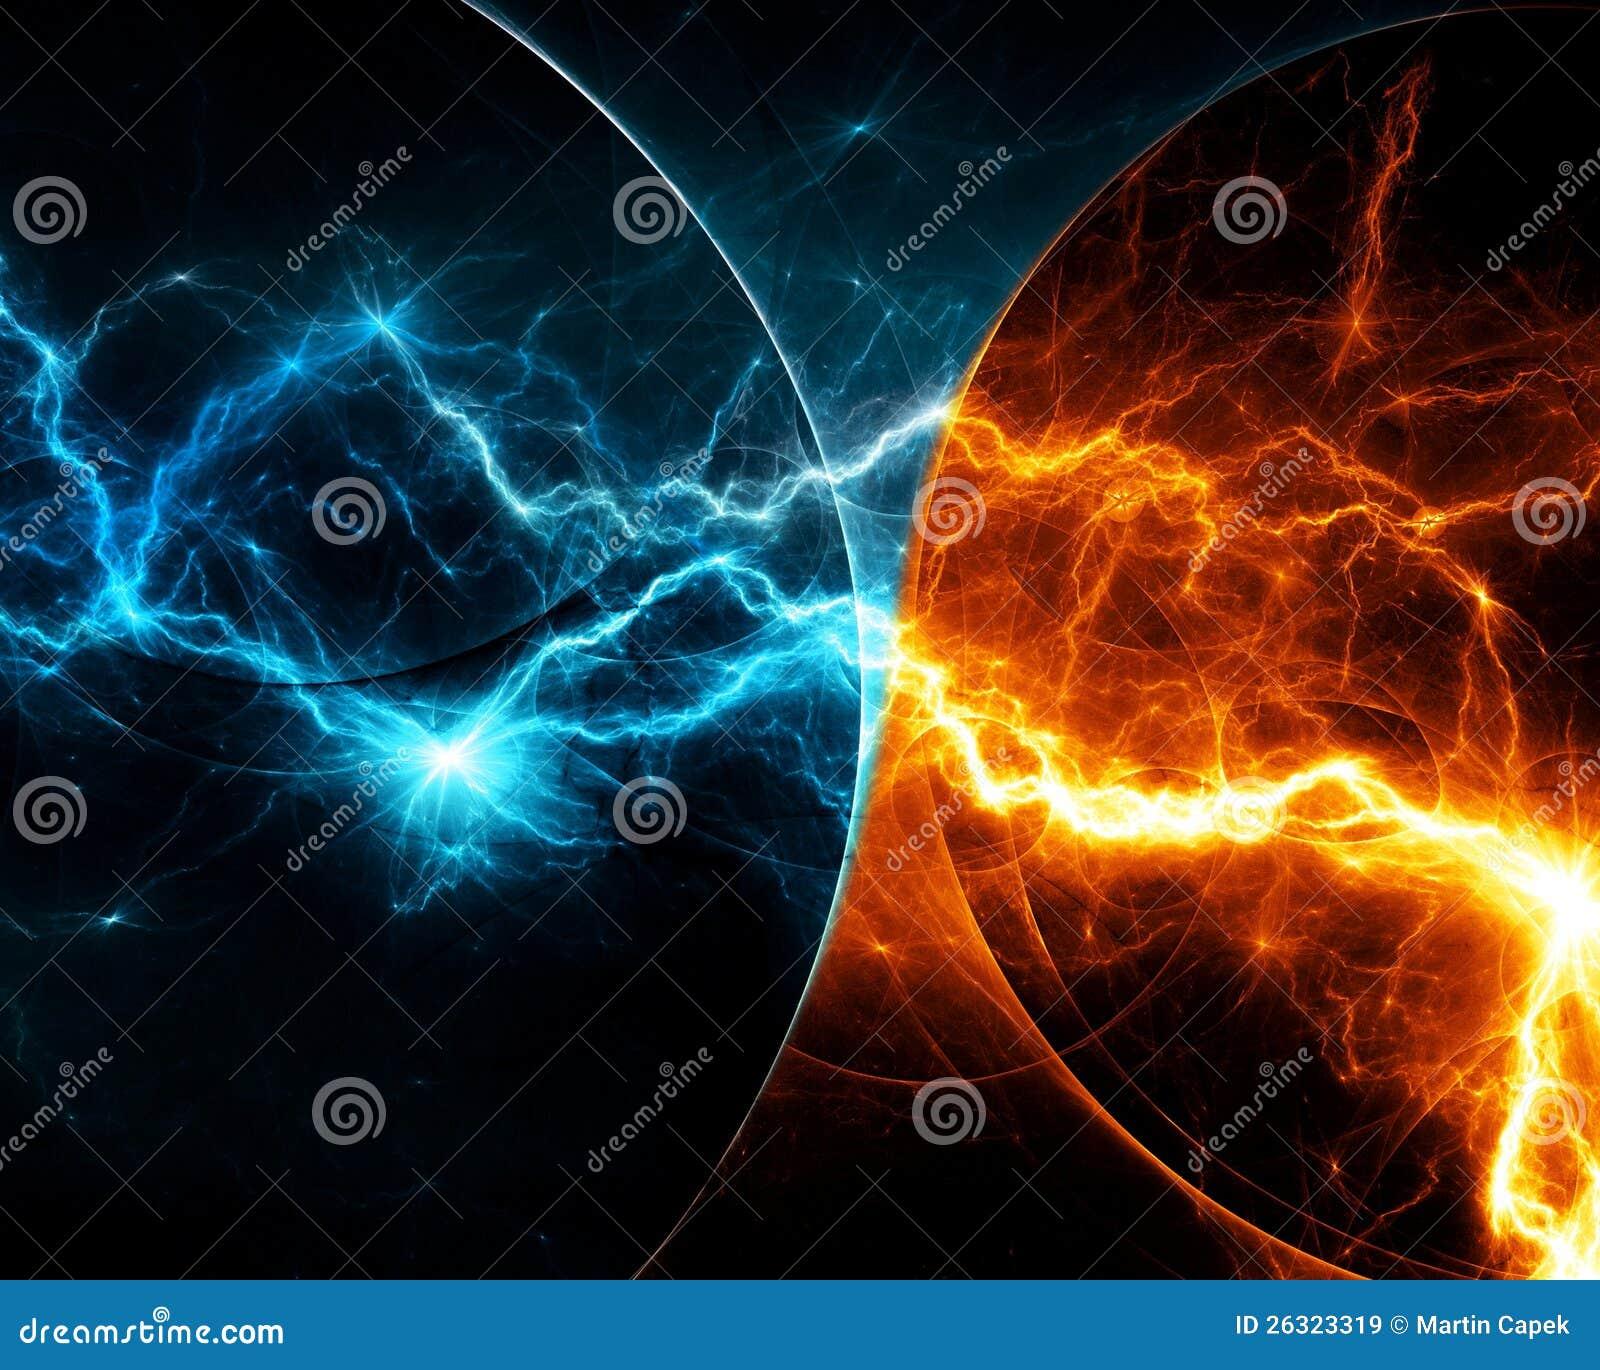 Fire And Lightning Wallpaper | www.pixshark.com - Images ...